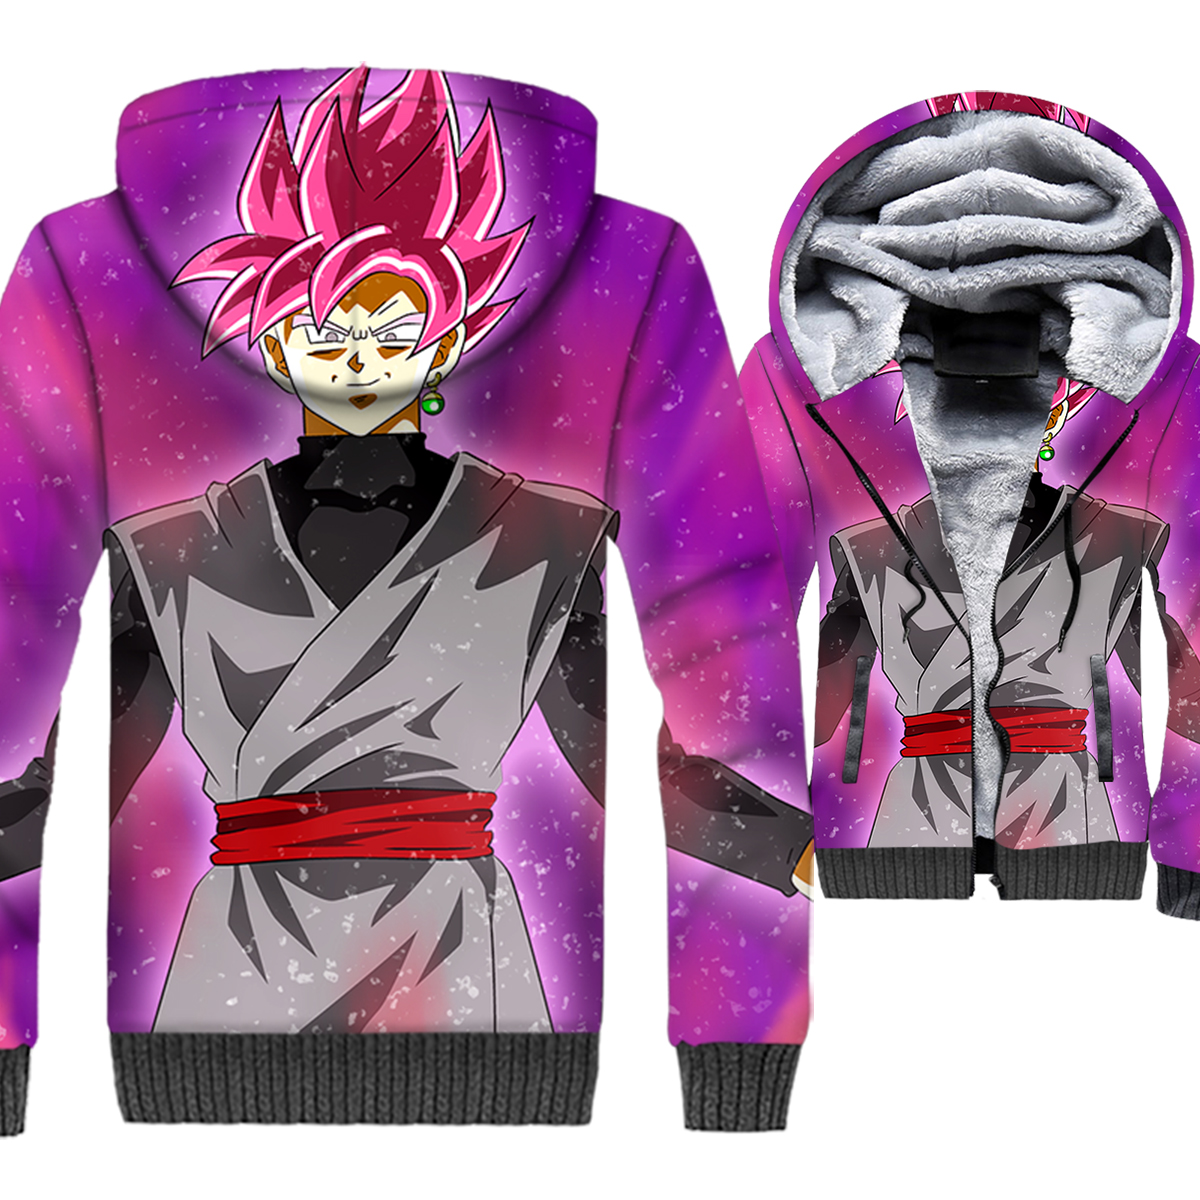 Dragon Ball Trunks 3D Print Hoodie Men Japan Anime Super Saiyan Hooded Sweatshirt Harajuku Coat Winter Fleece Vegeta Jacket Mens